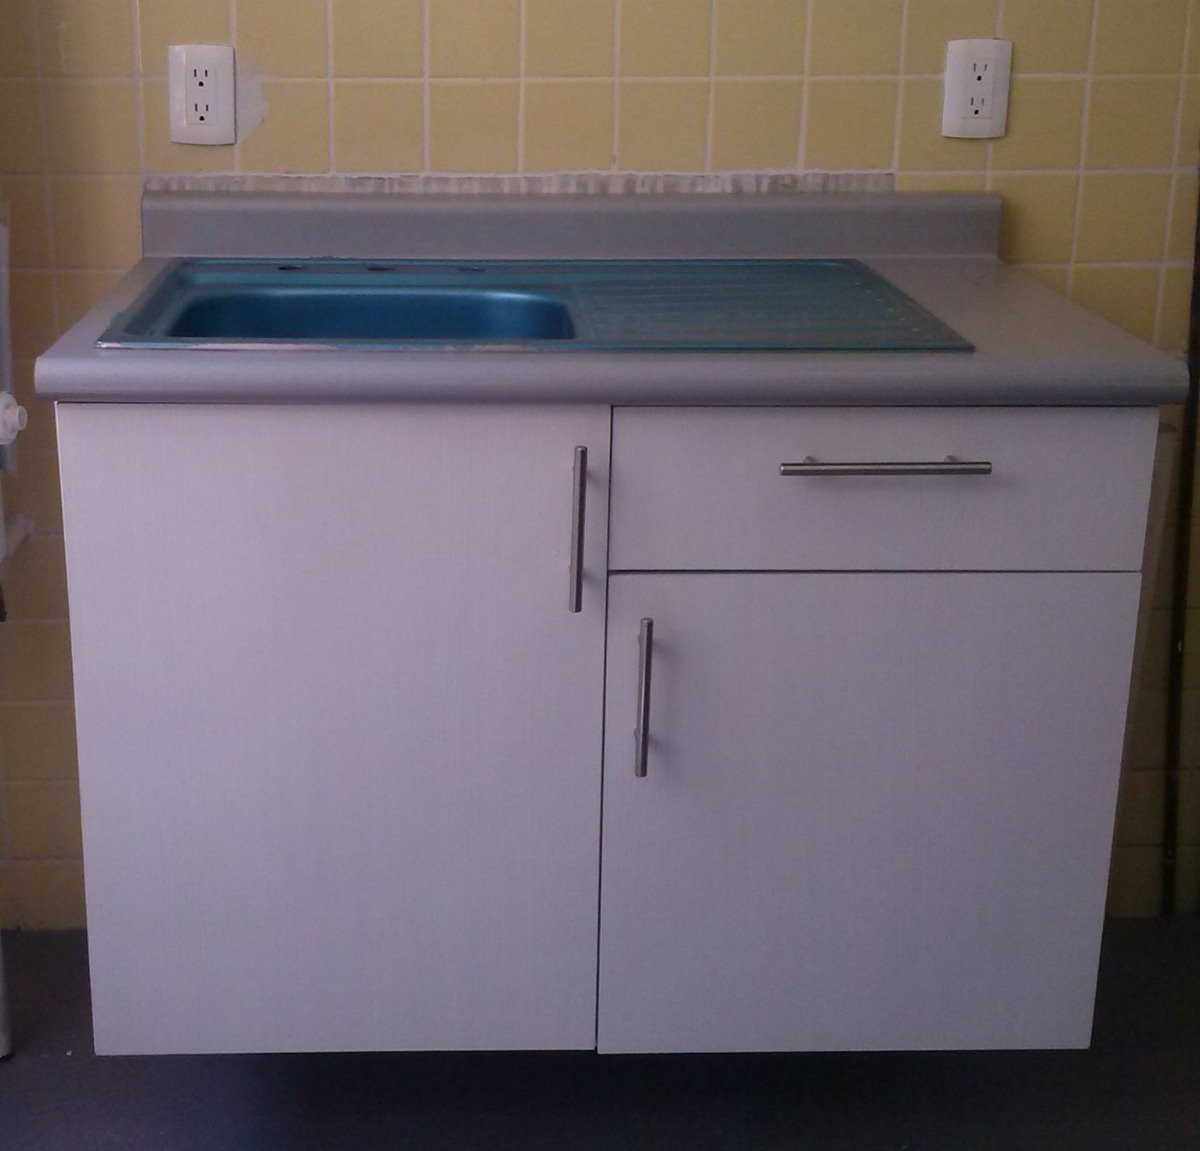 Mueble Para Fregadero Con Tarja Para Cocina Integral Vv4